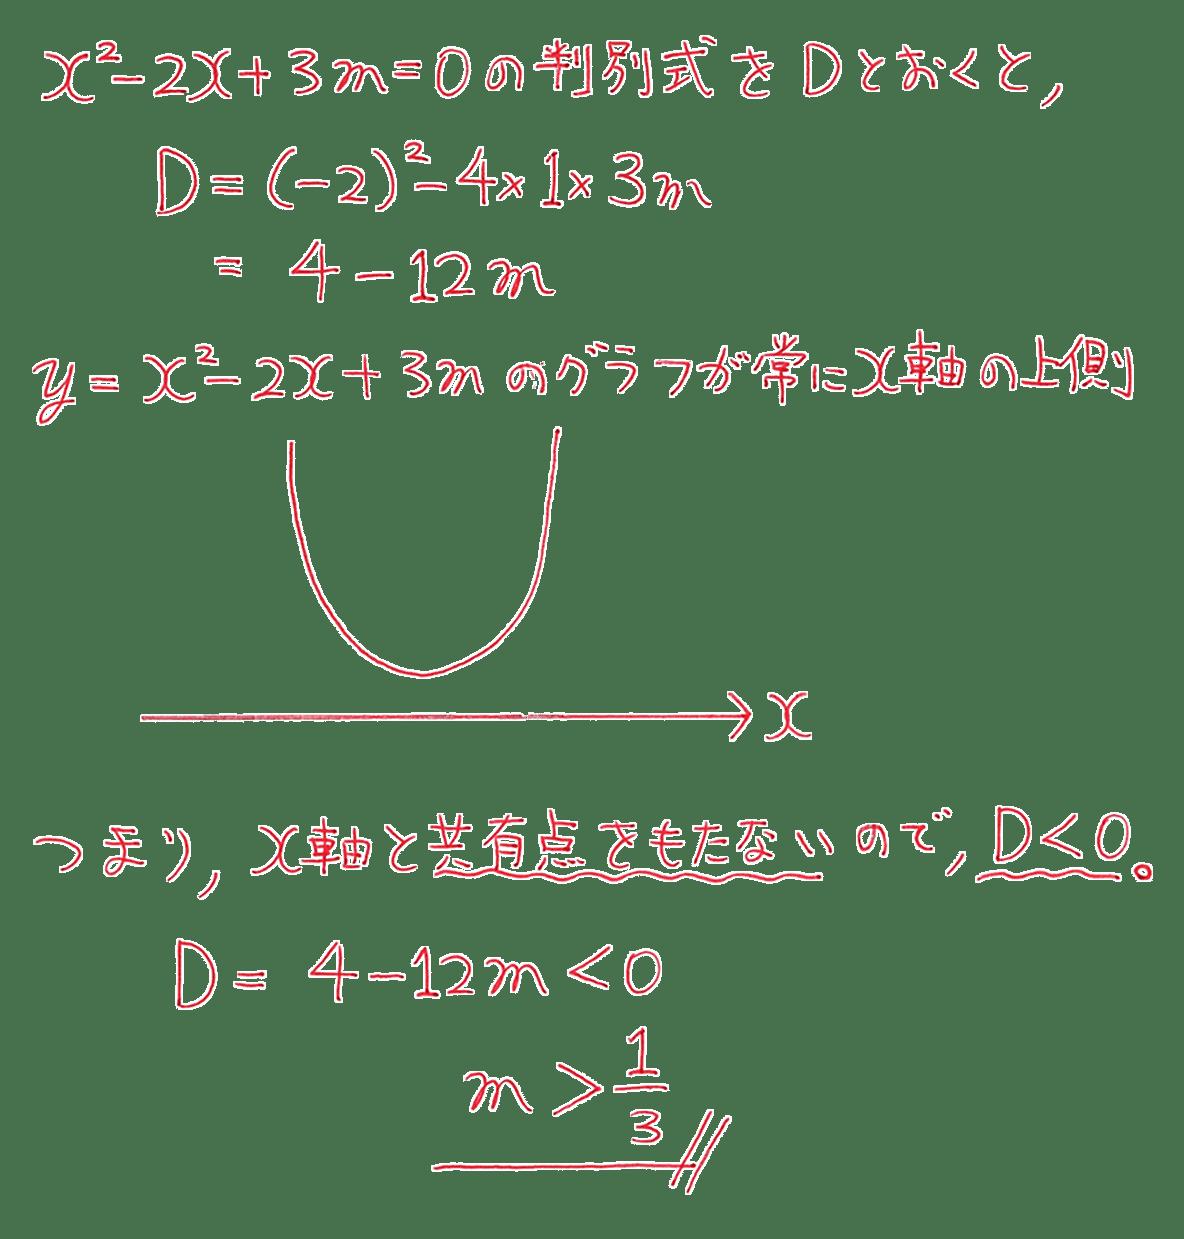 高校数学Ⅰ 2次関数37 練習の答え